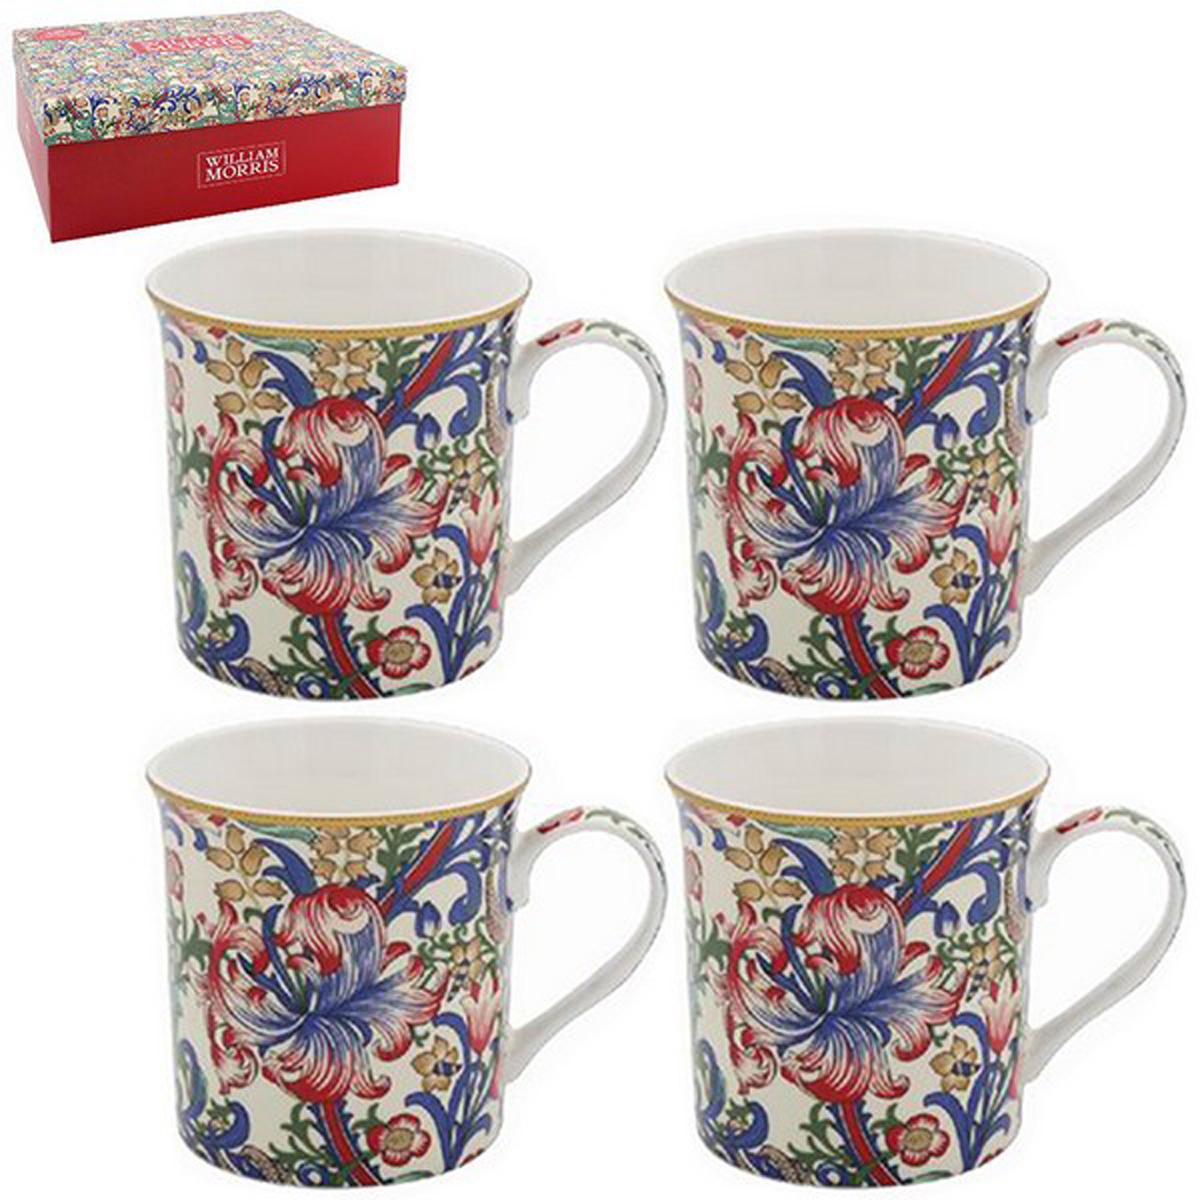 Coffret mugs porcelaine \'William Morris Collection\' - Golden Lily (4 mugs) 85x85 mm - [R2680]